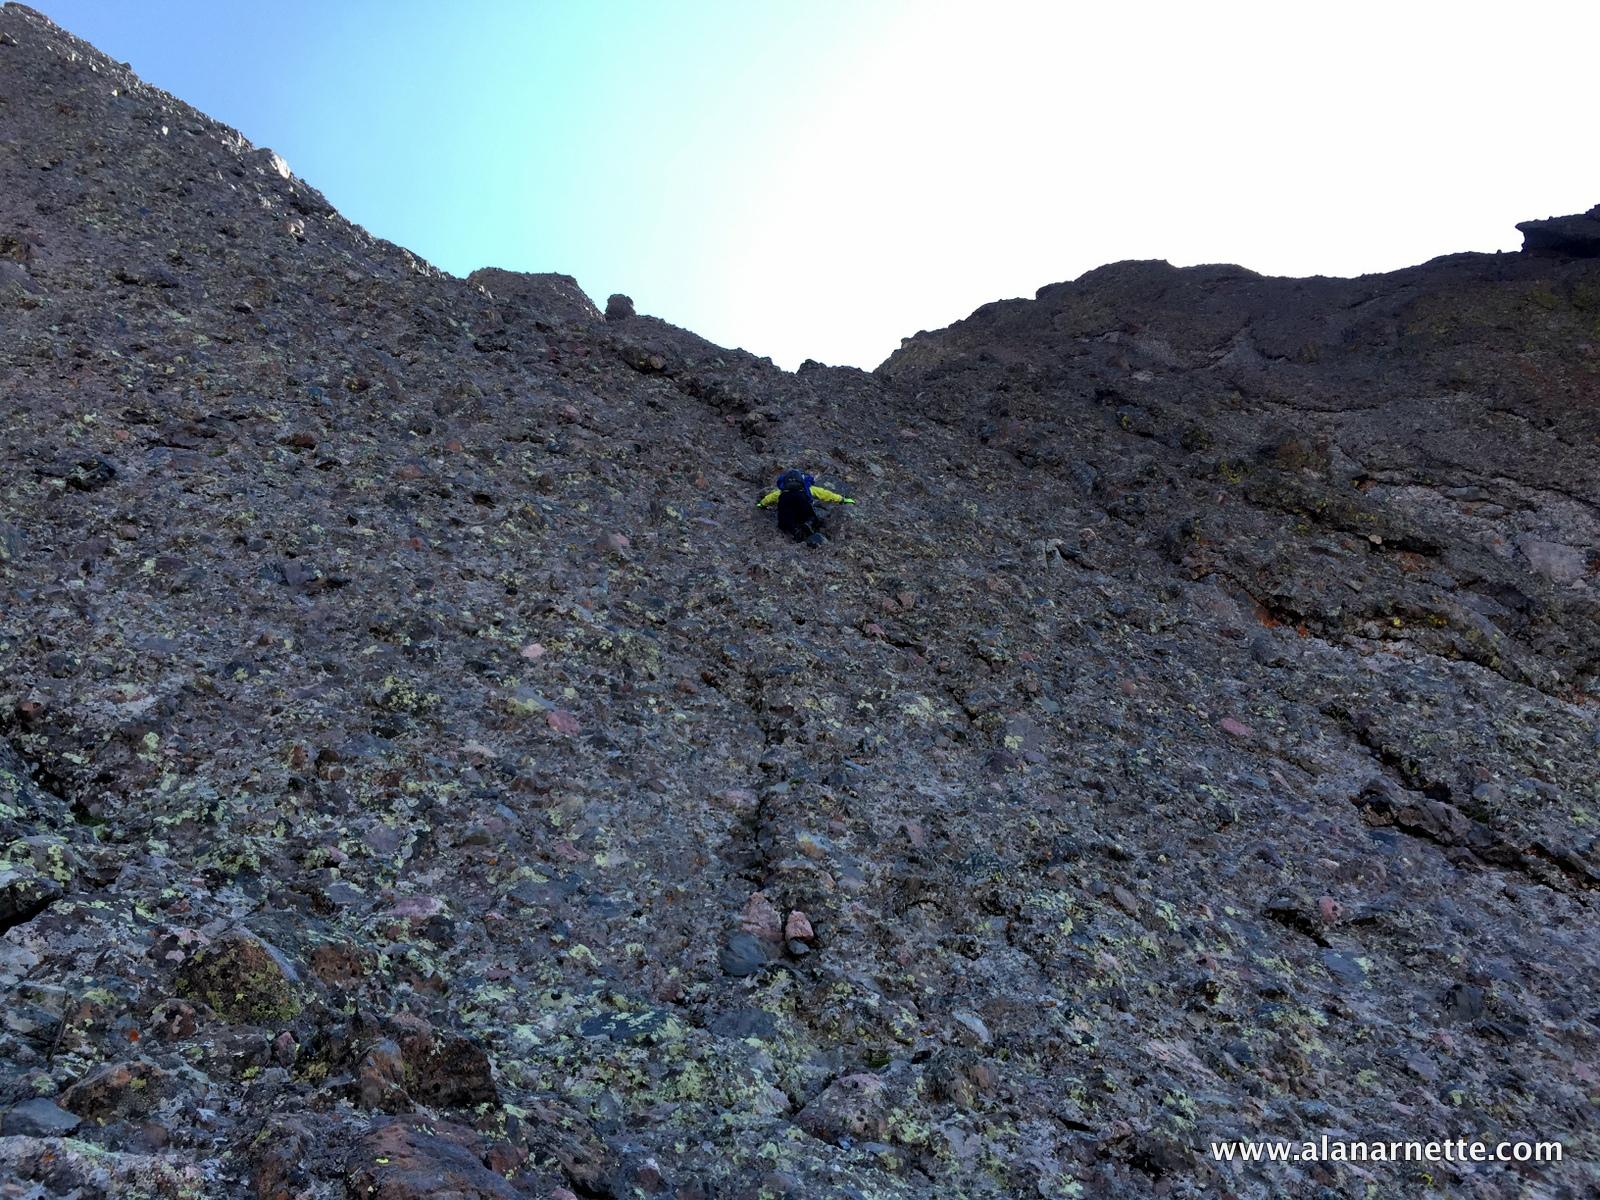 Climbing one of two headwalls, Class 4